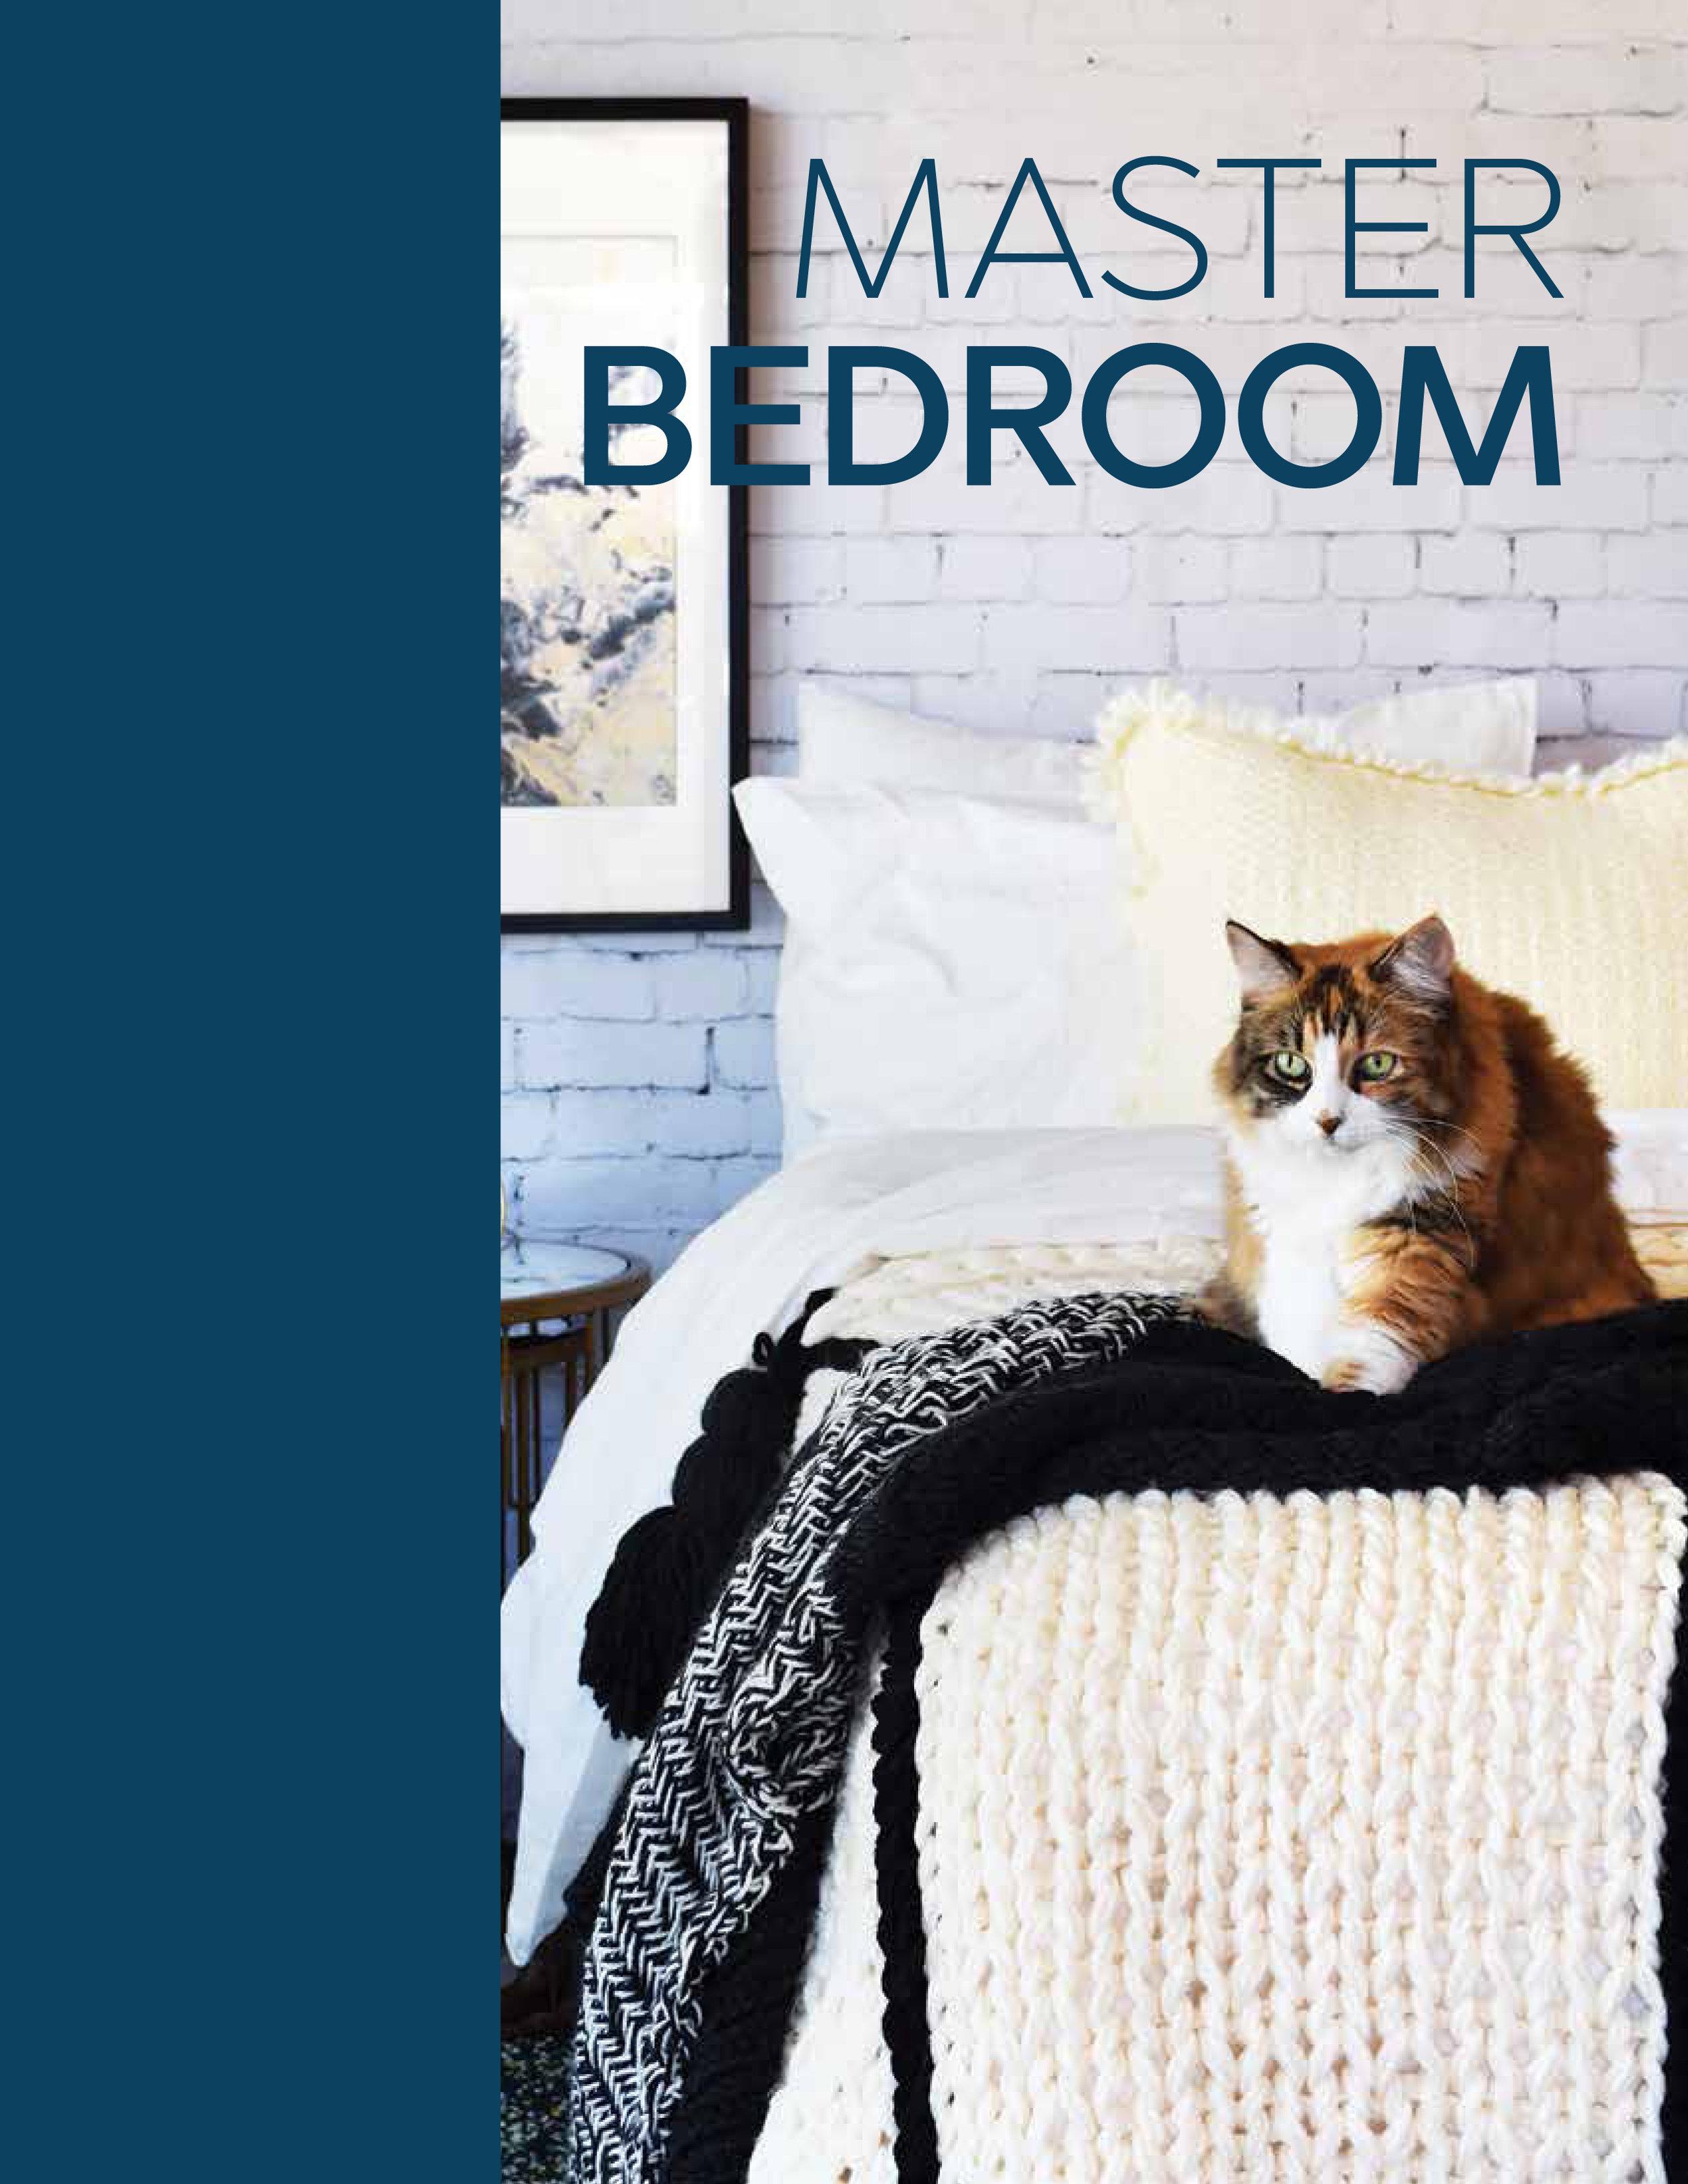 Master Bedroom - Pinstripe BlanketHerringbone Throw BlanketLinen Stitch Pillowcase